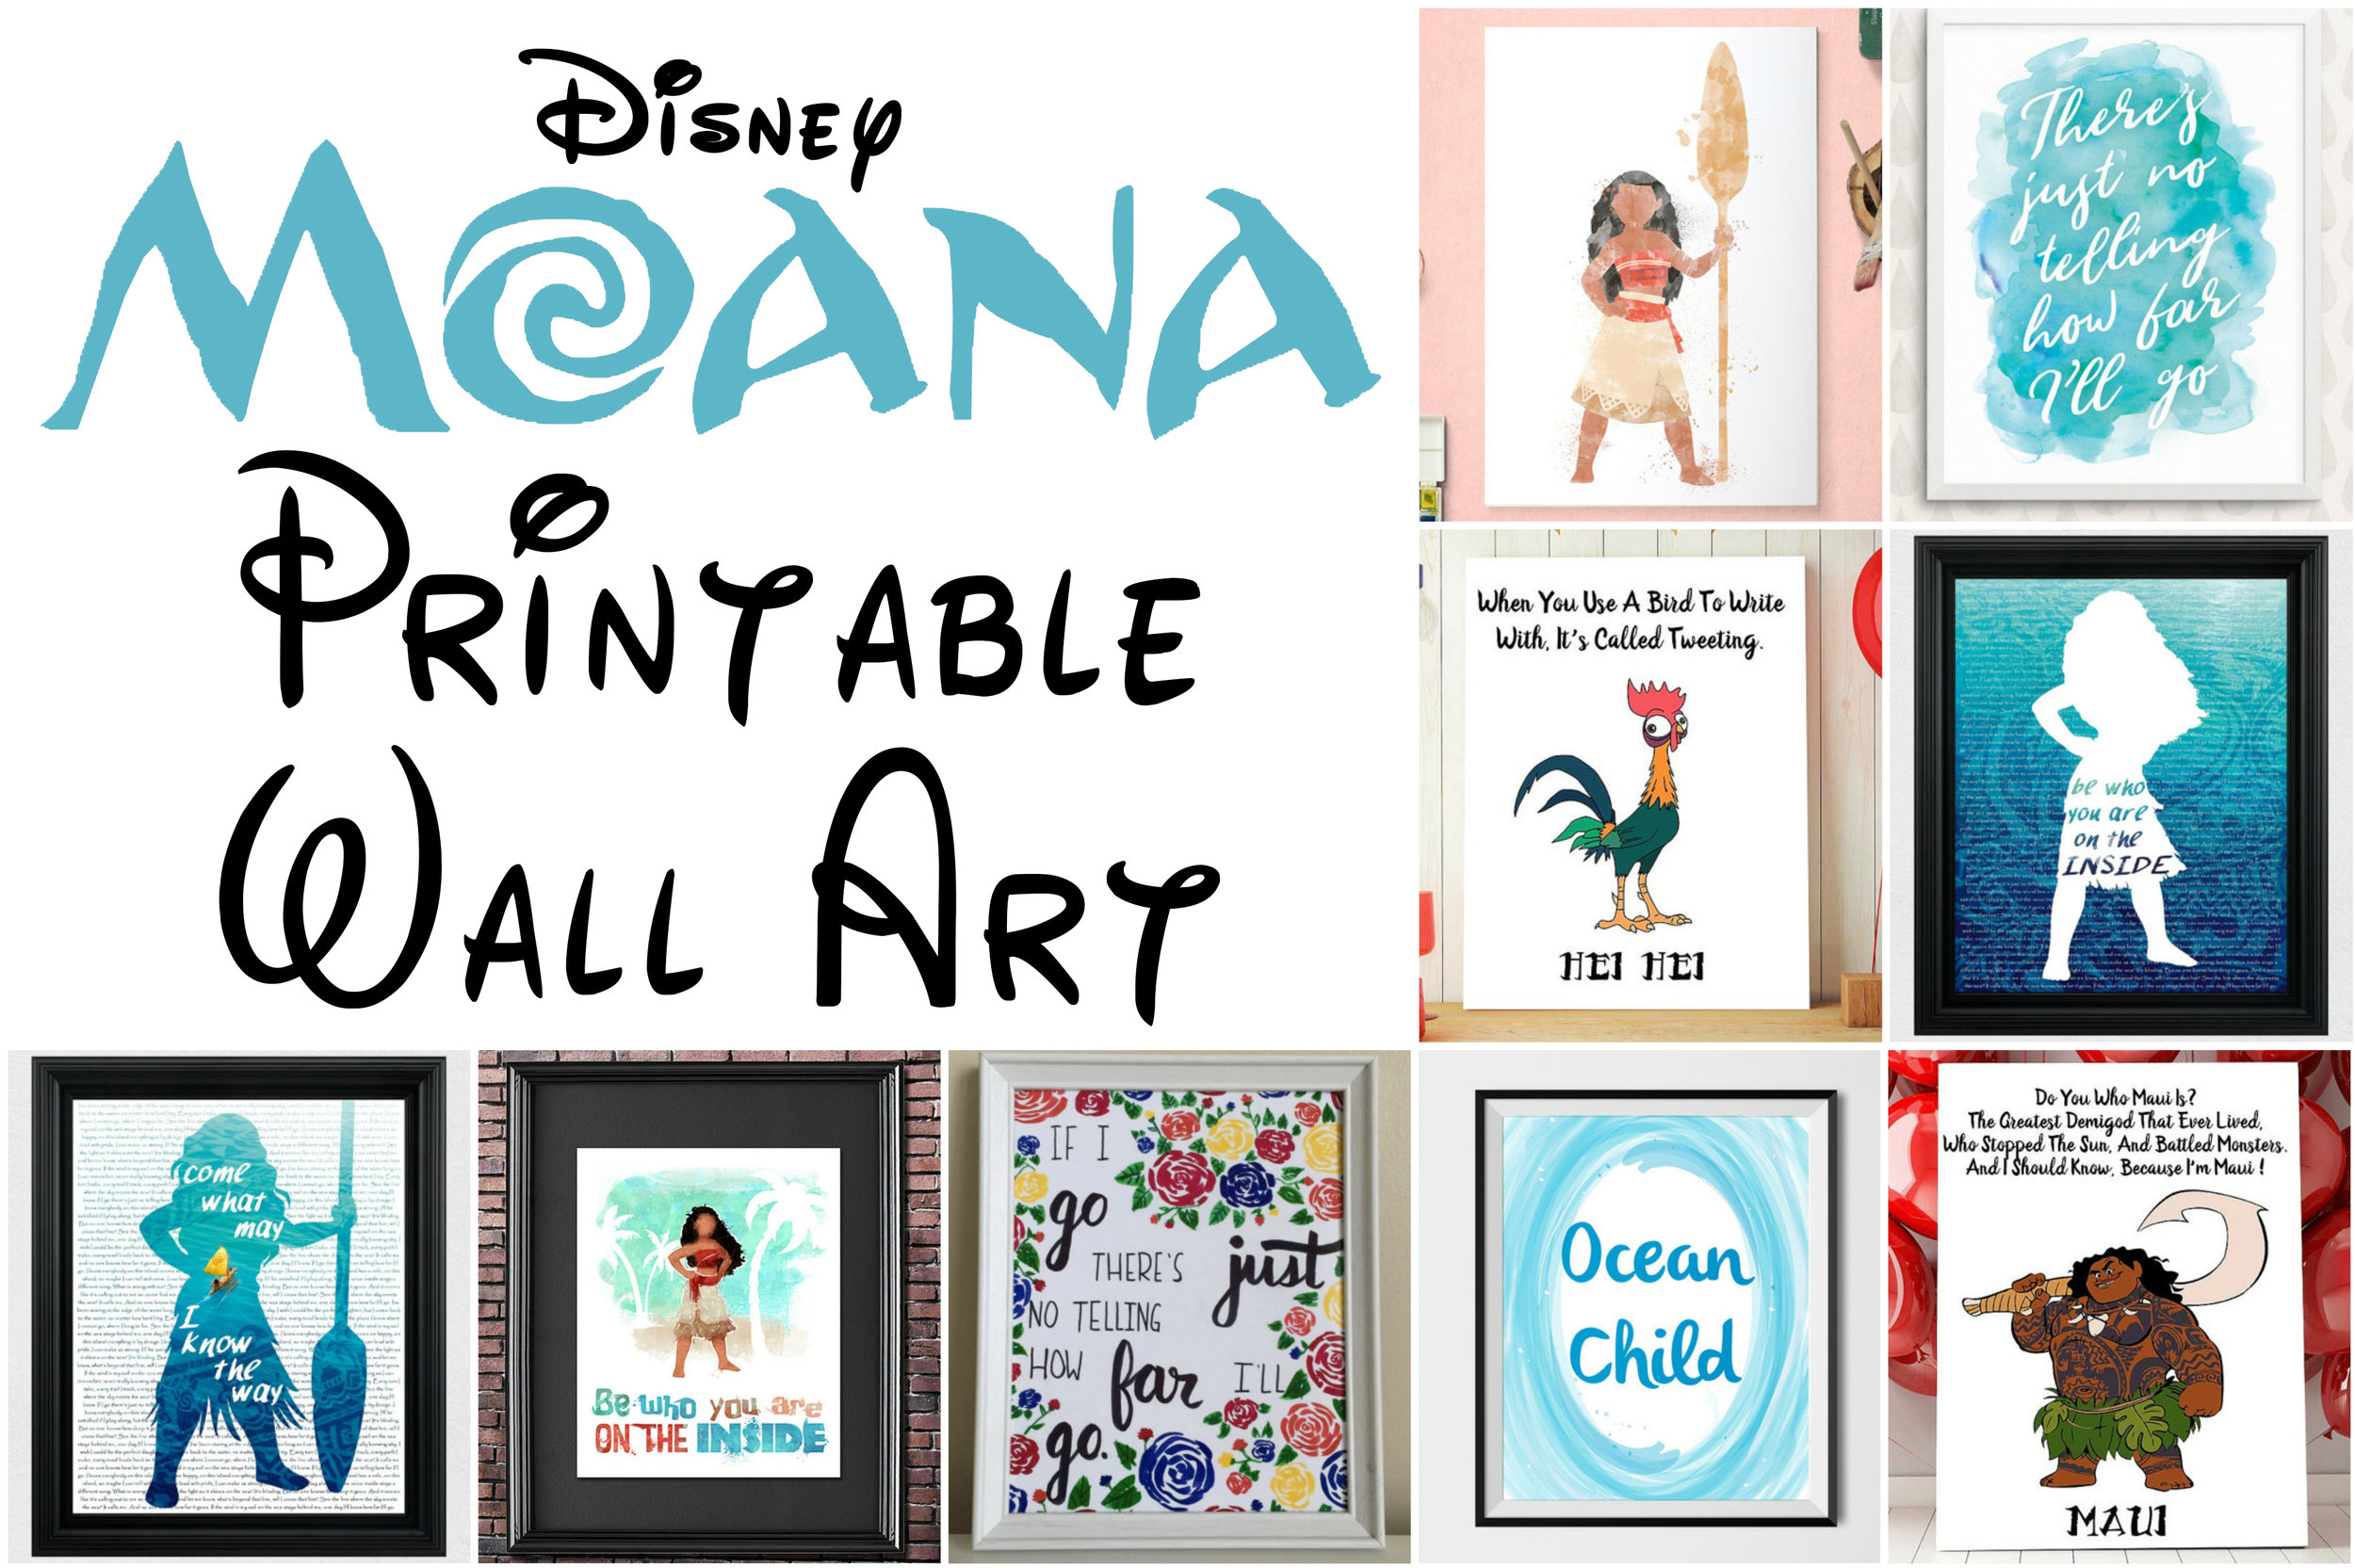 photograph about Eye Printable named Eye Catching Disney Moana Printable Artwork Shots and Wall